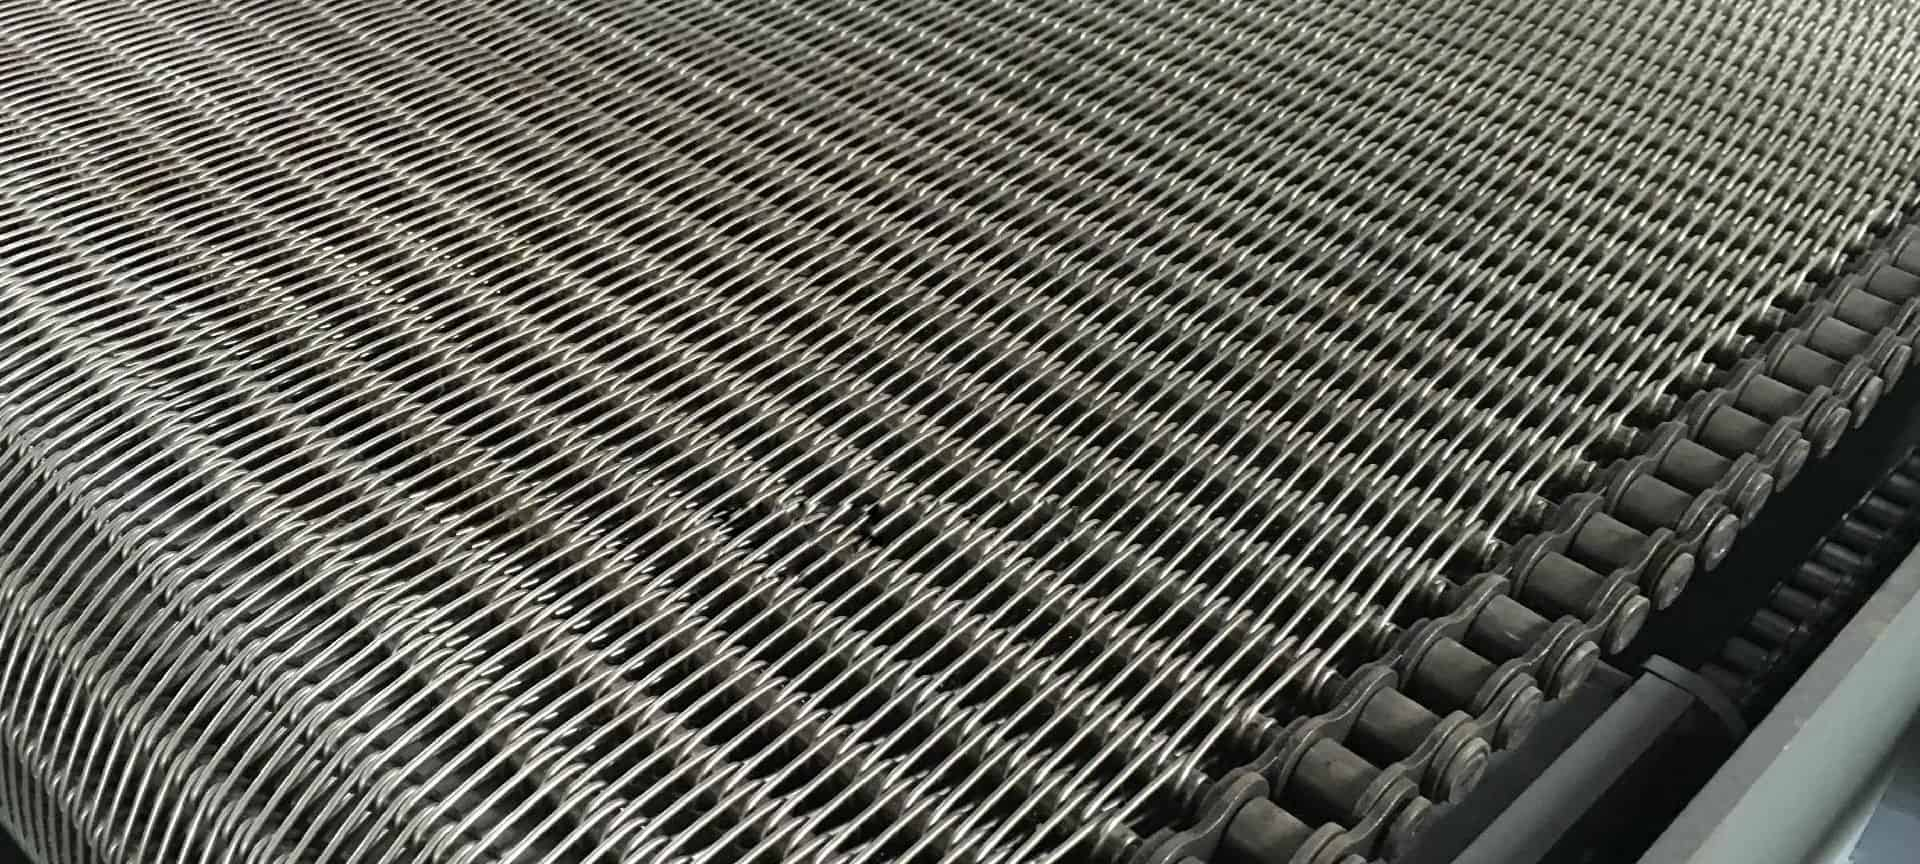 Conveyor Belt Wire highest quality standards